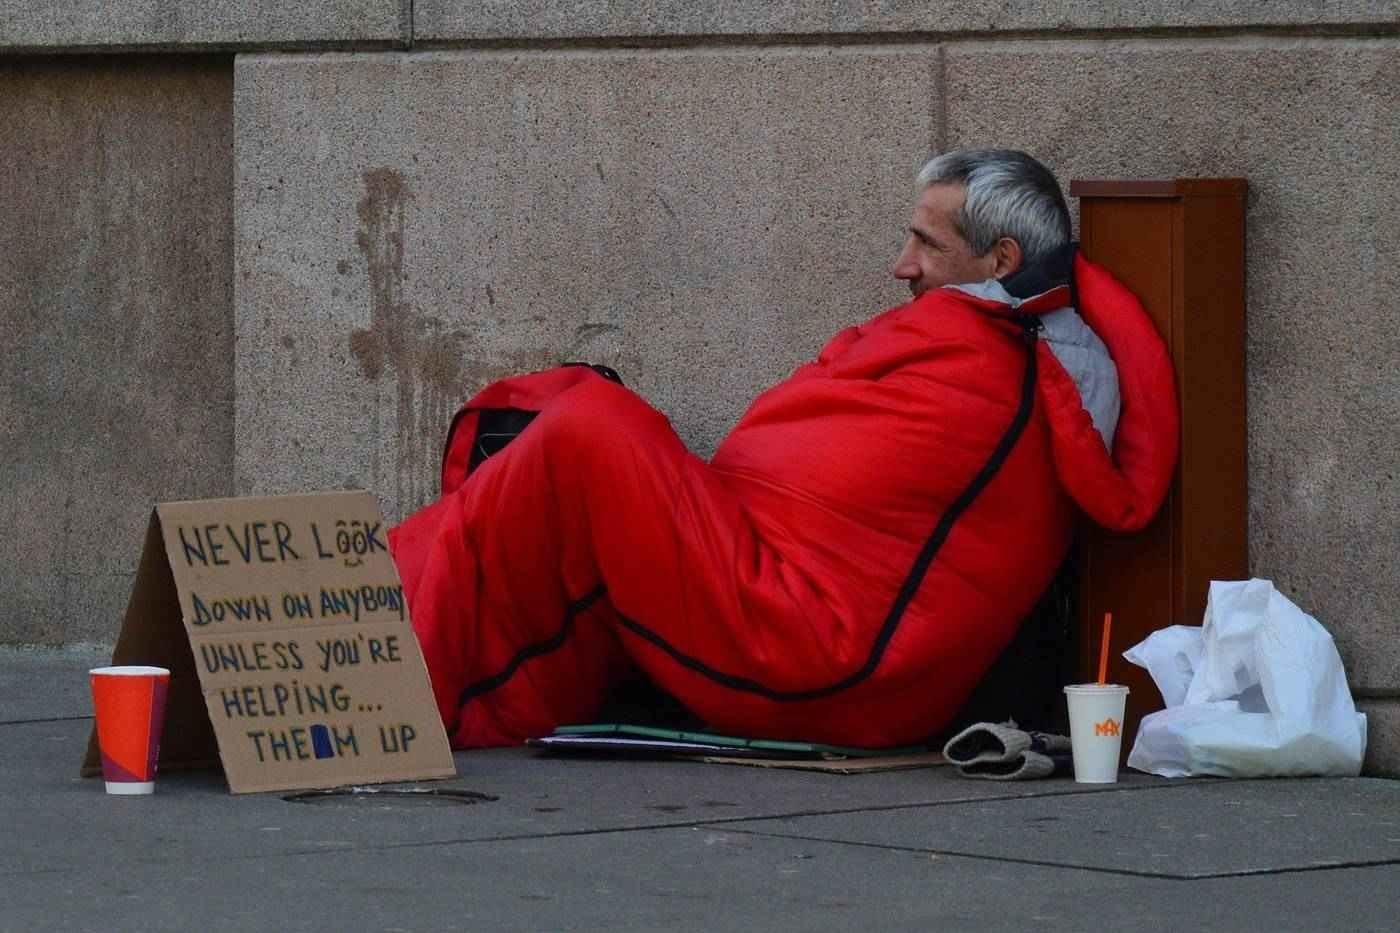 Homeless man in sleeping bag